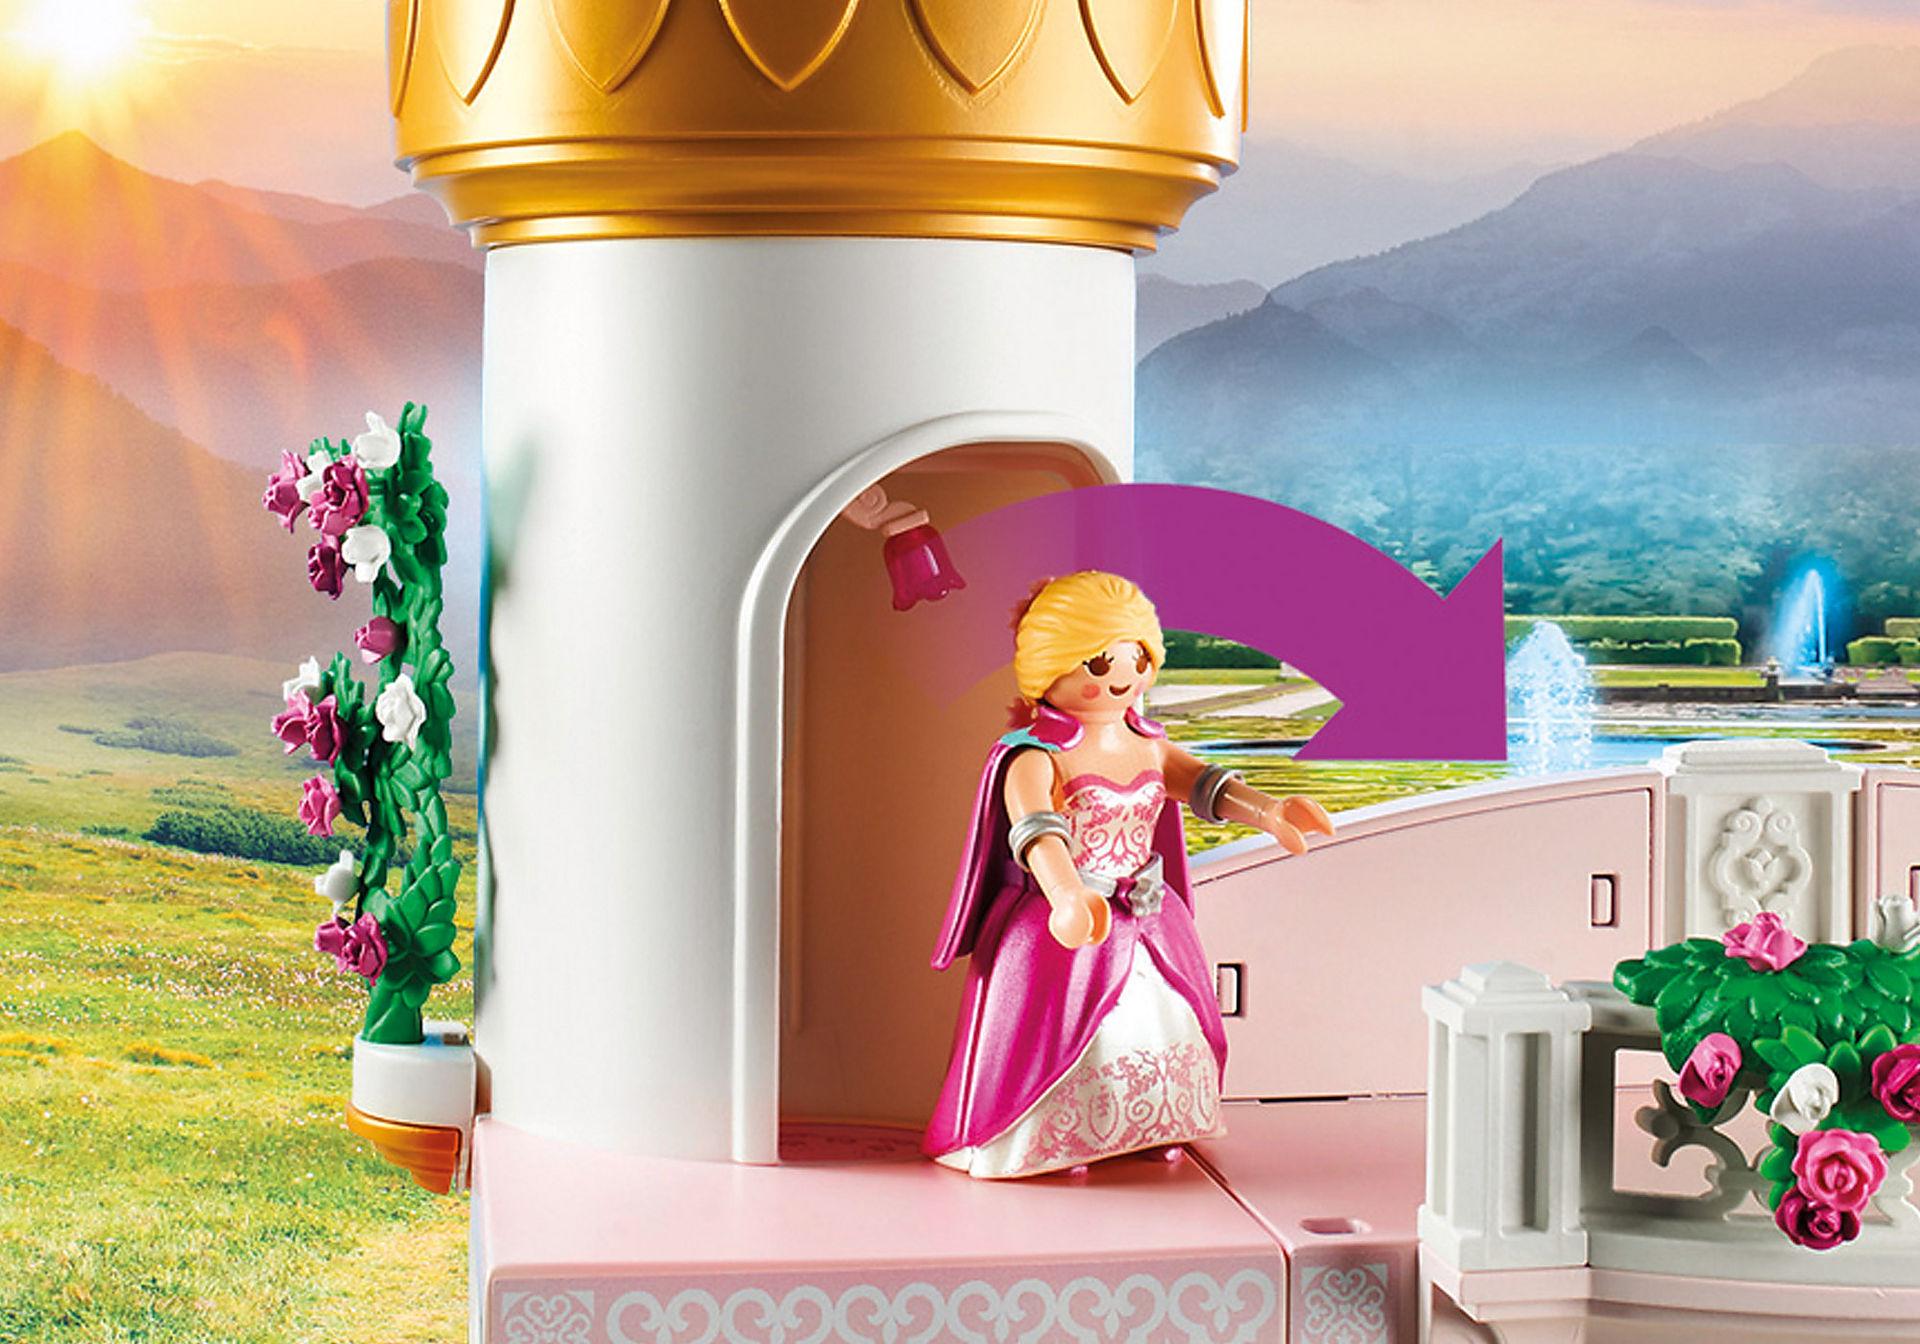 70448 Palais de princesse zoom image5